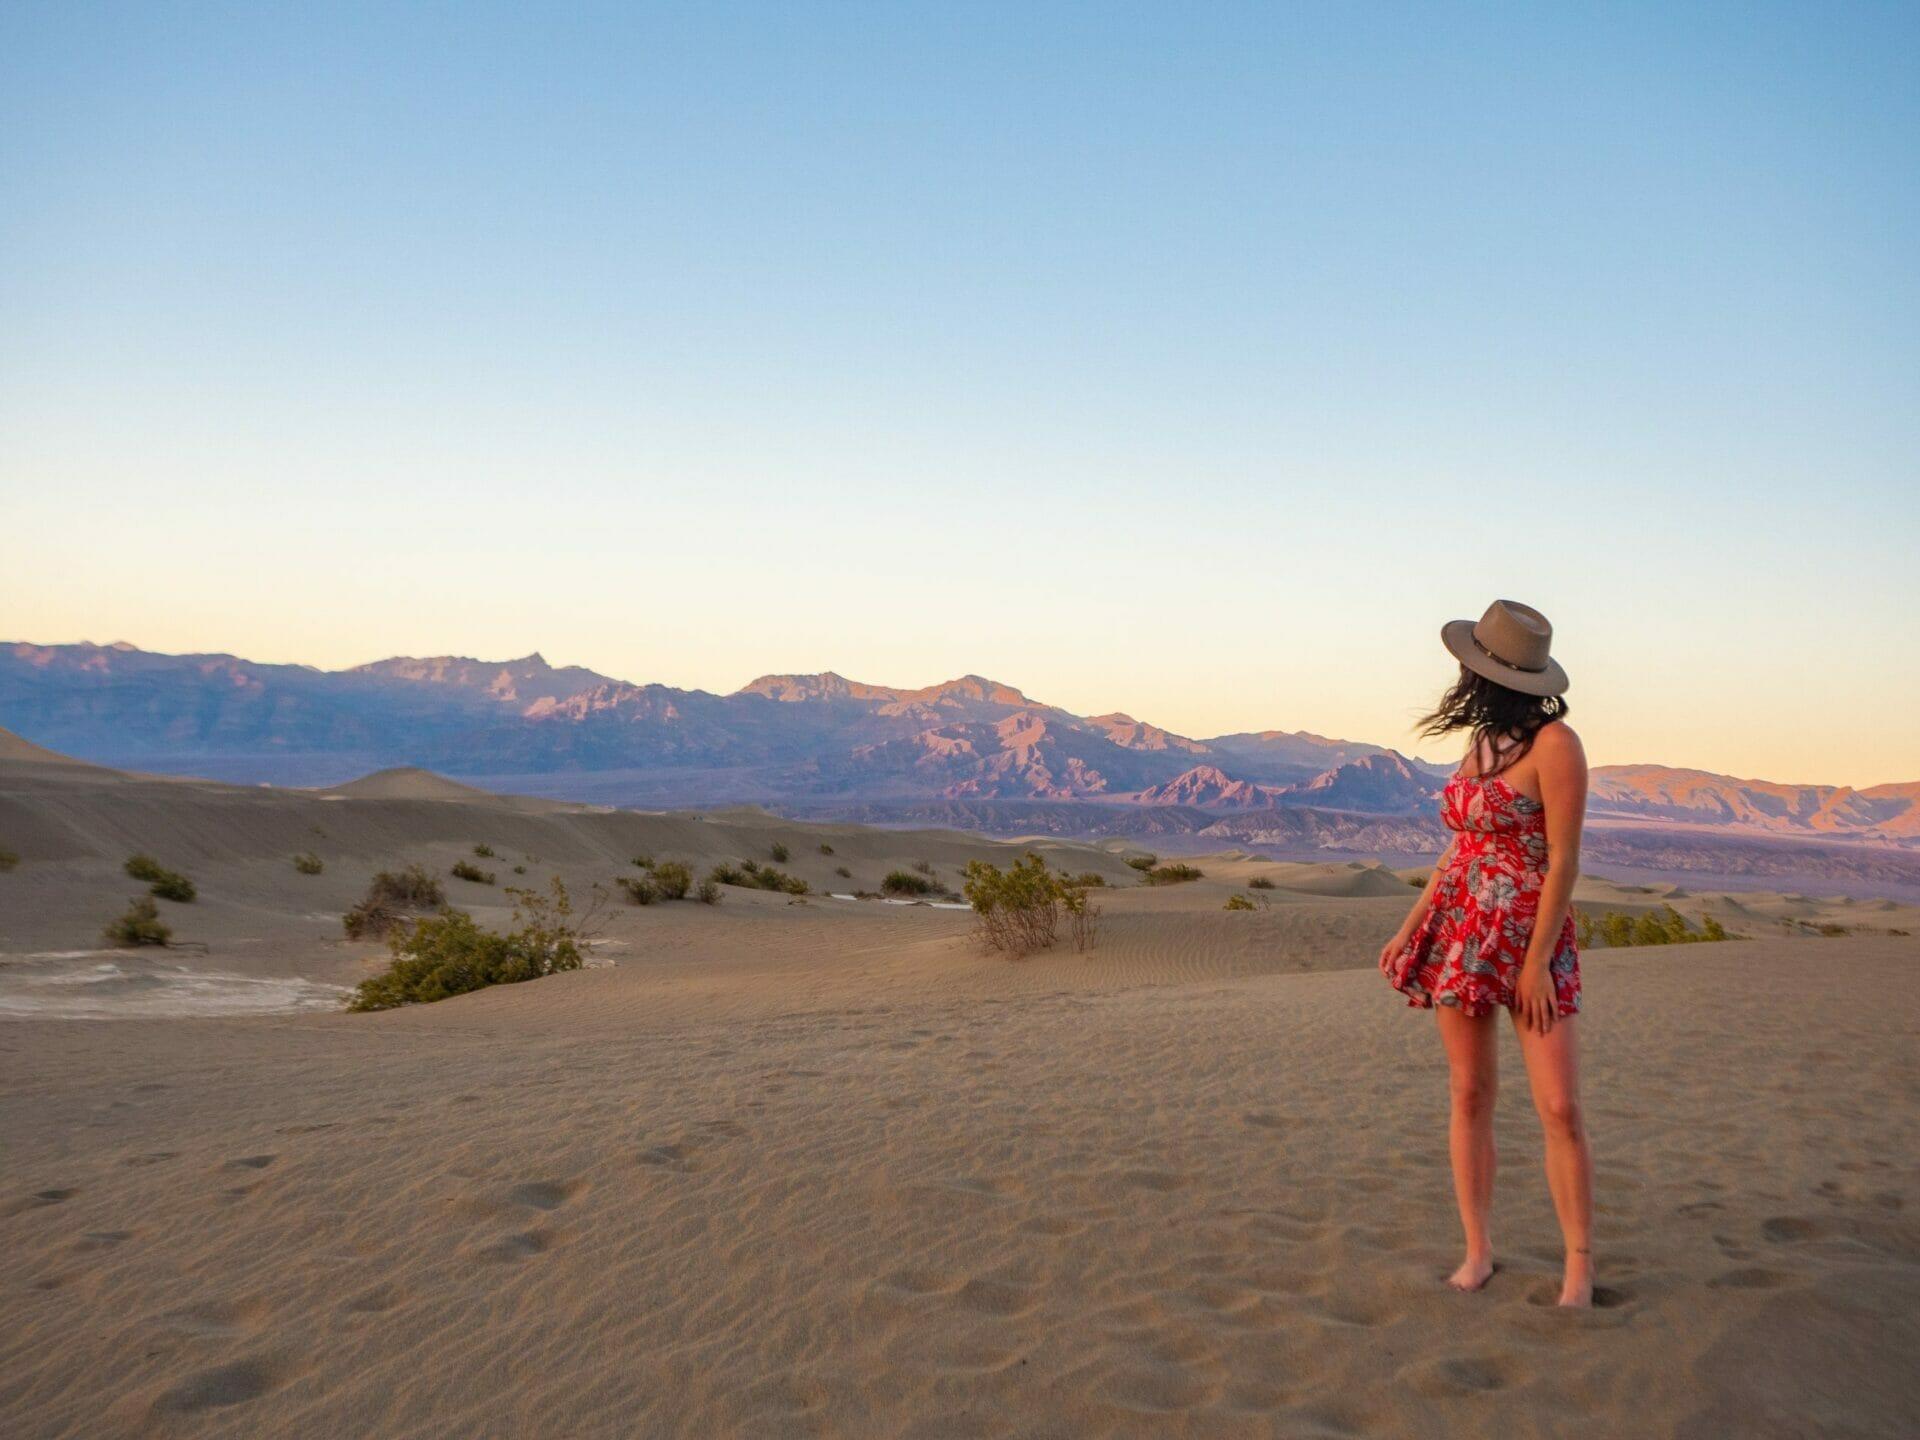 Death Valley National Park Mesquite Sand Dunes